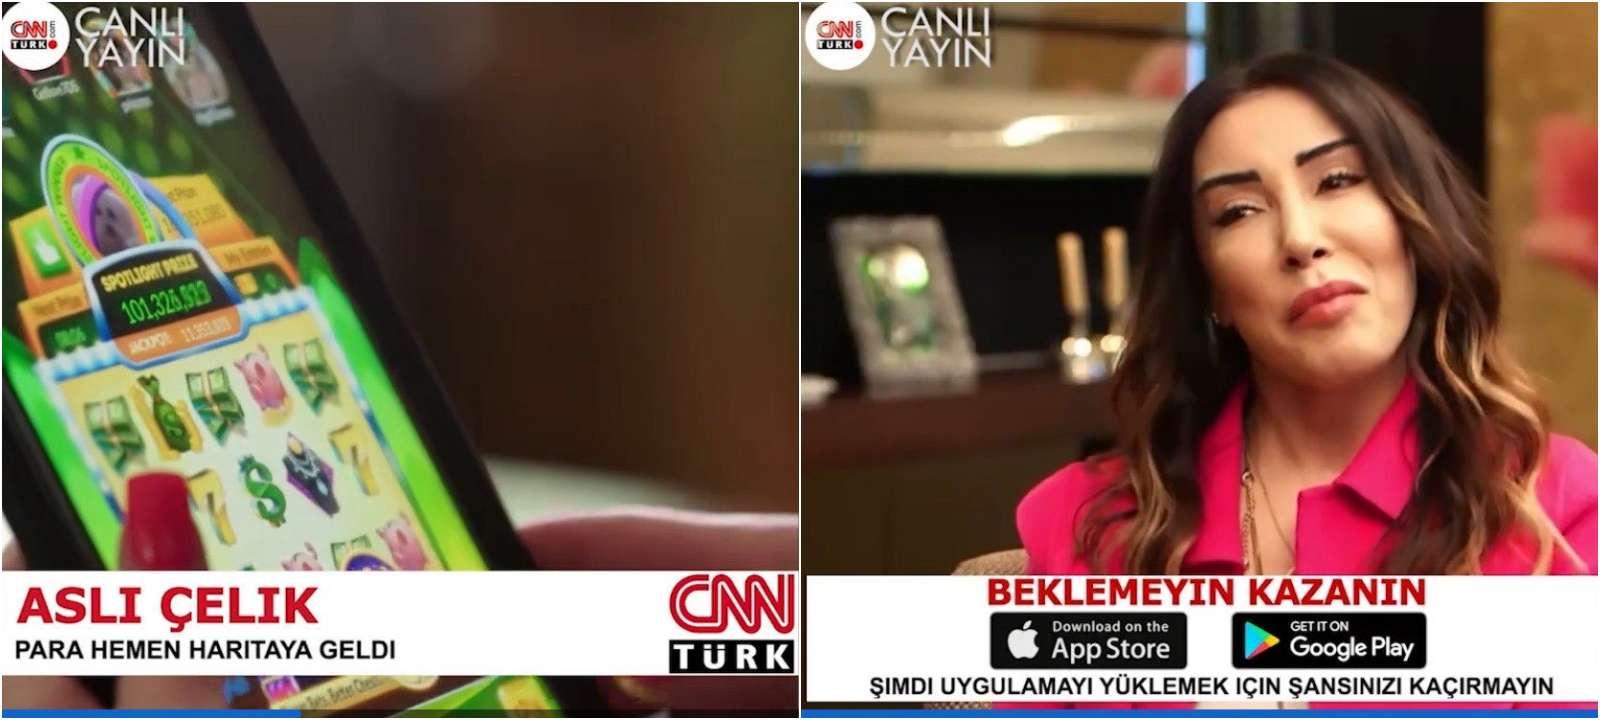 jungle runner cnn türk